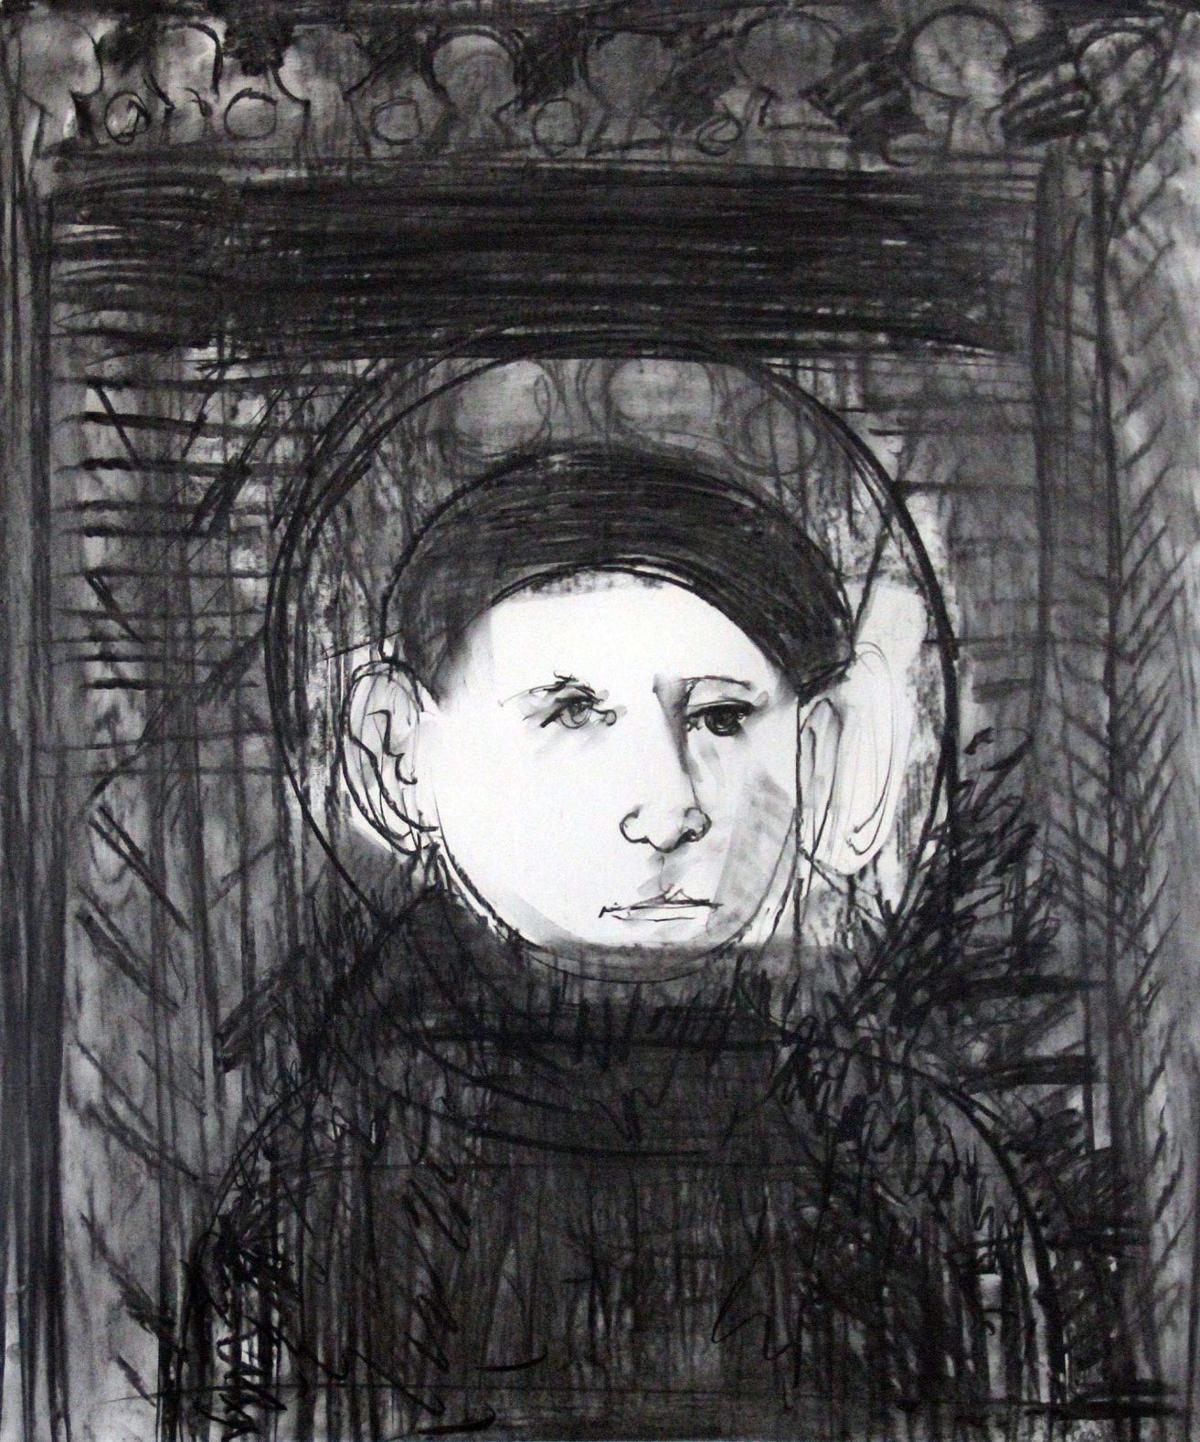 John Kaericher artwork (untitled)